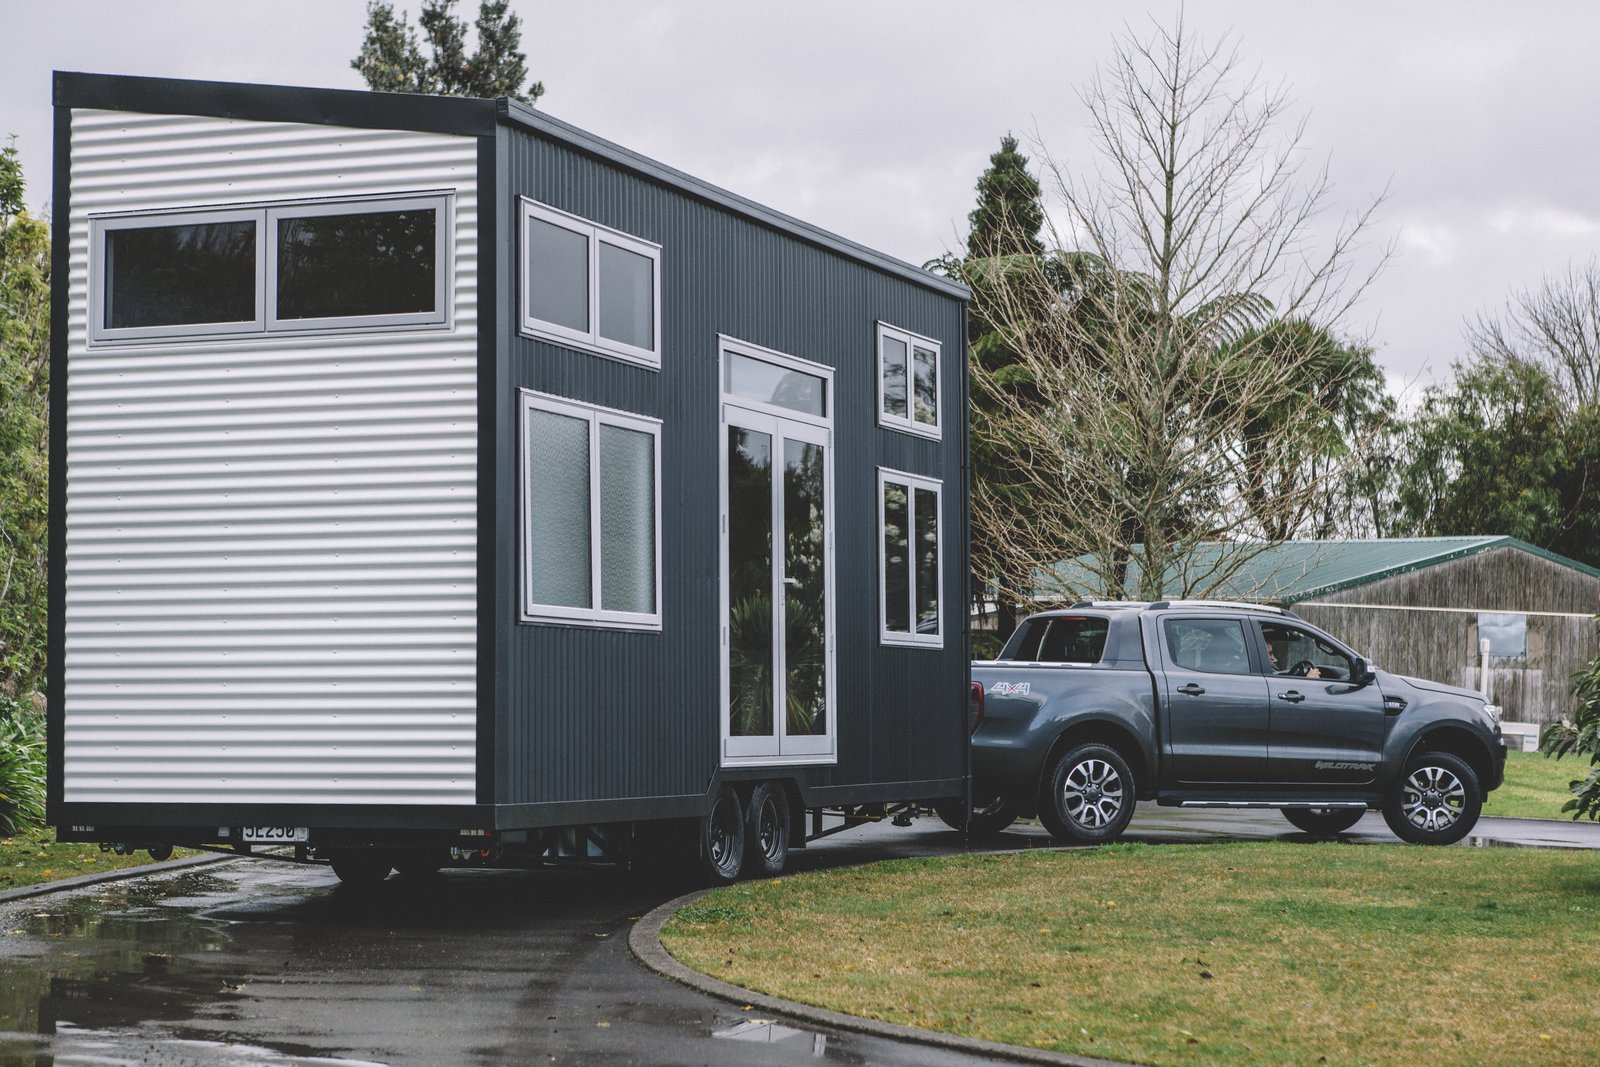 Millennial Tiny House exterior